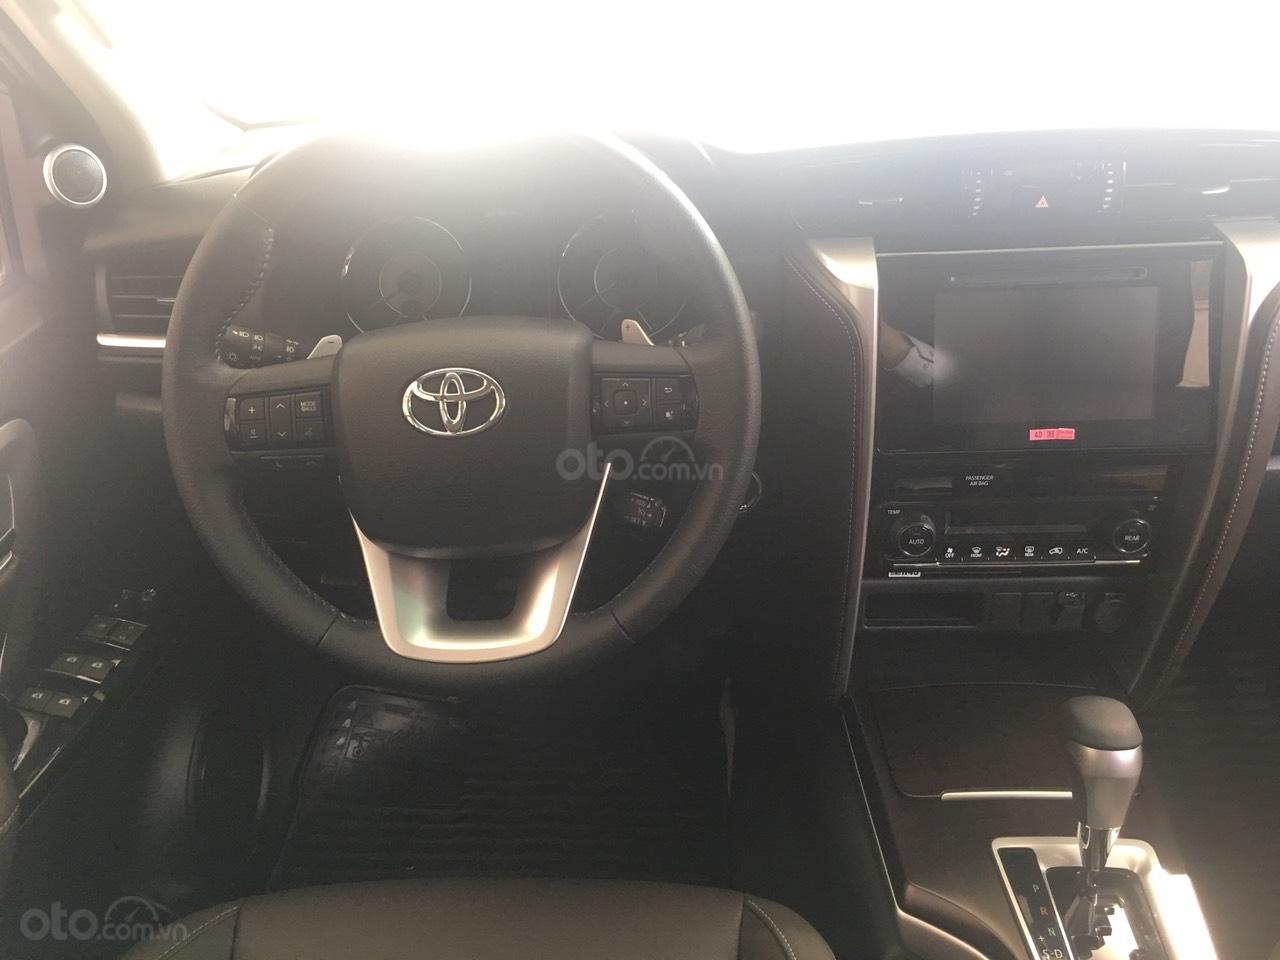 Toyota Fortuner 2.4G AT, giao ngay, giá cực tốt 0906882329 (4)